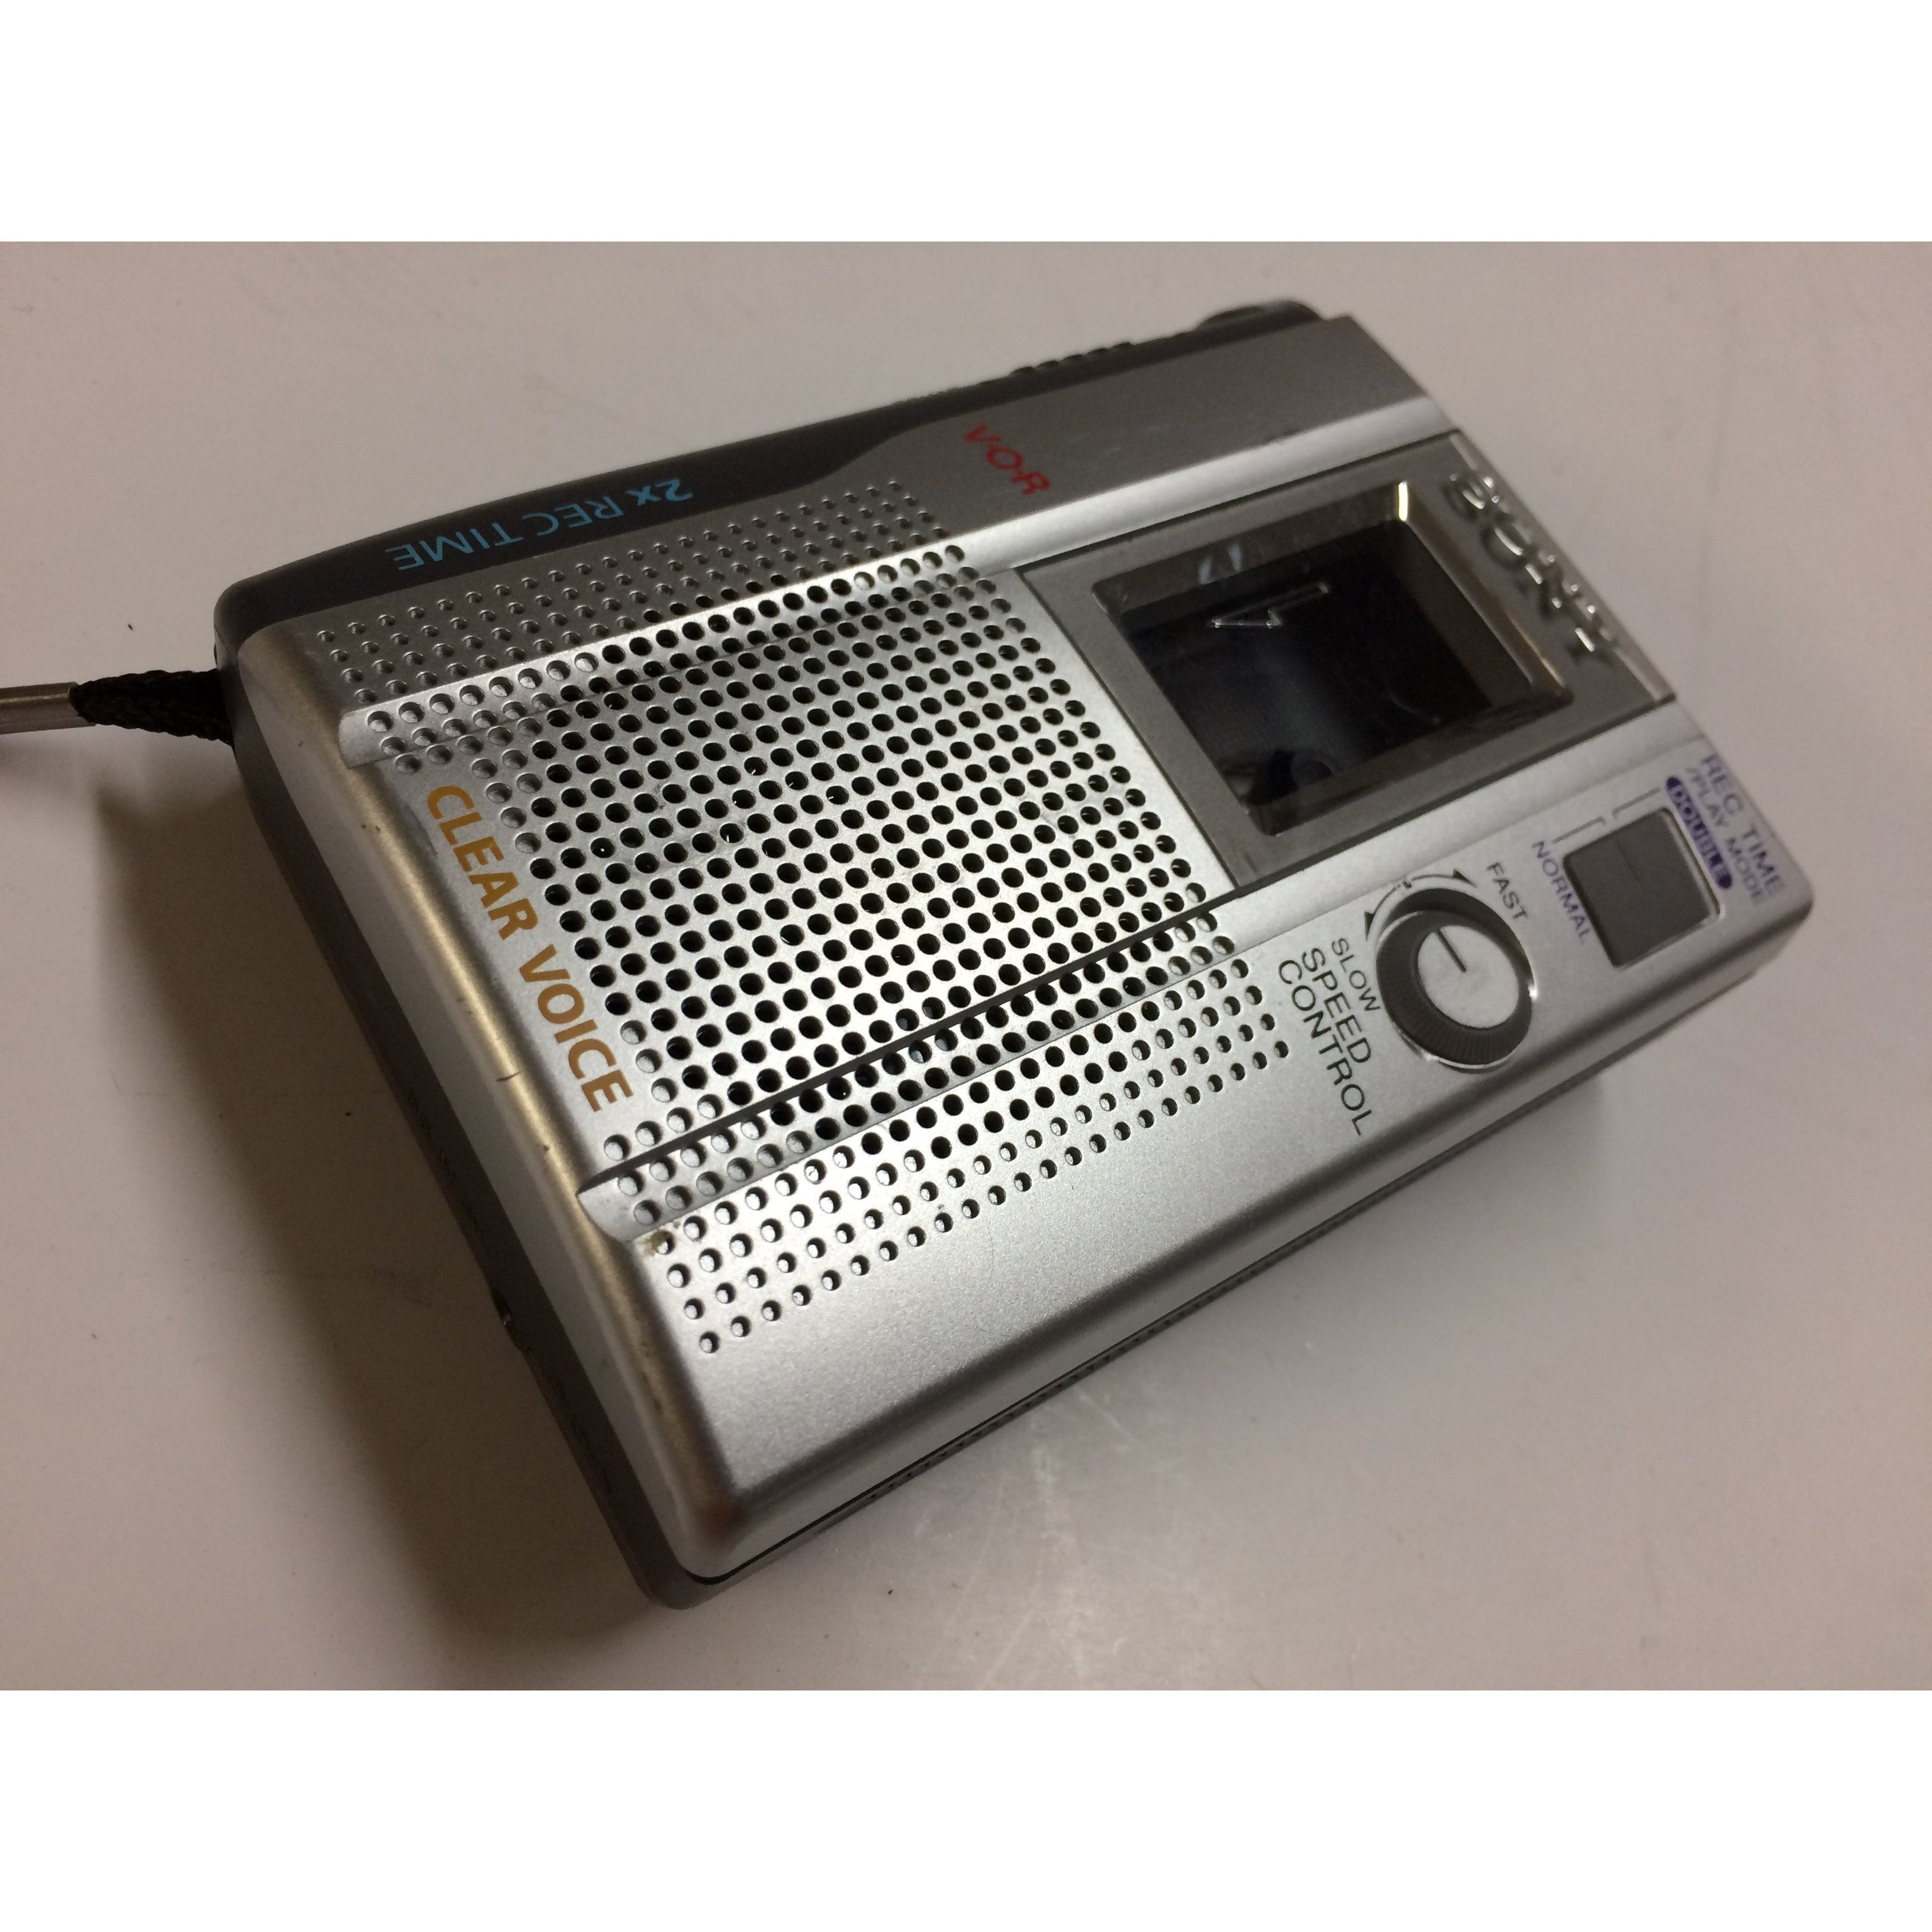 Sony Clear Voice TCM 200dv Audio Cassette Recorder